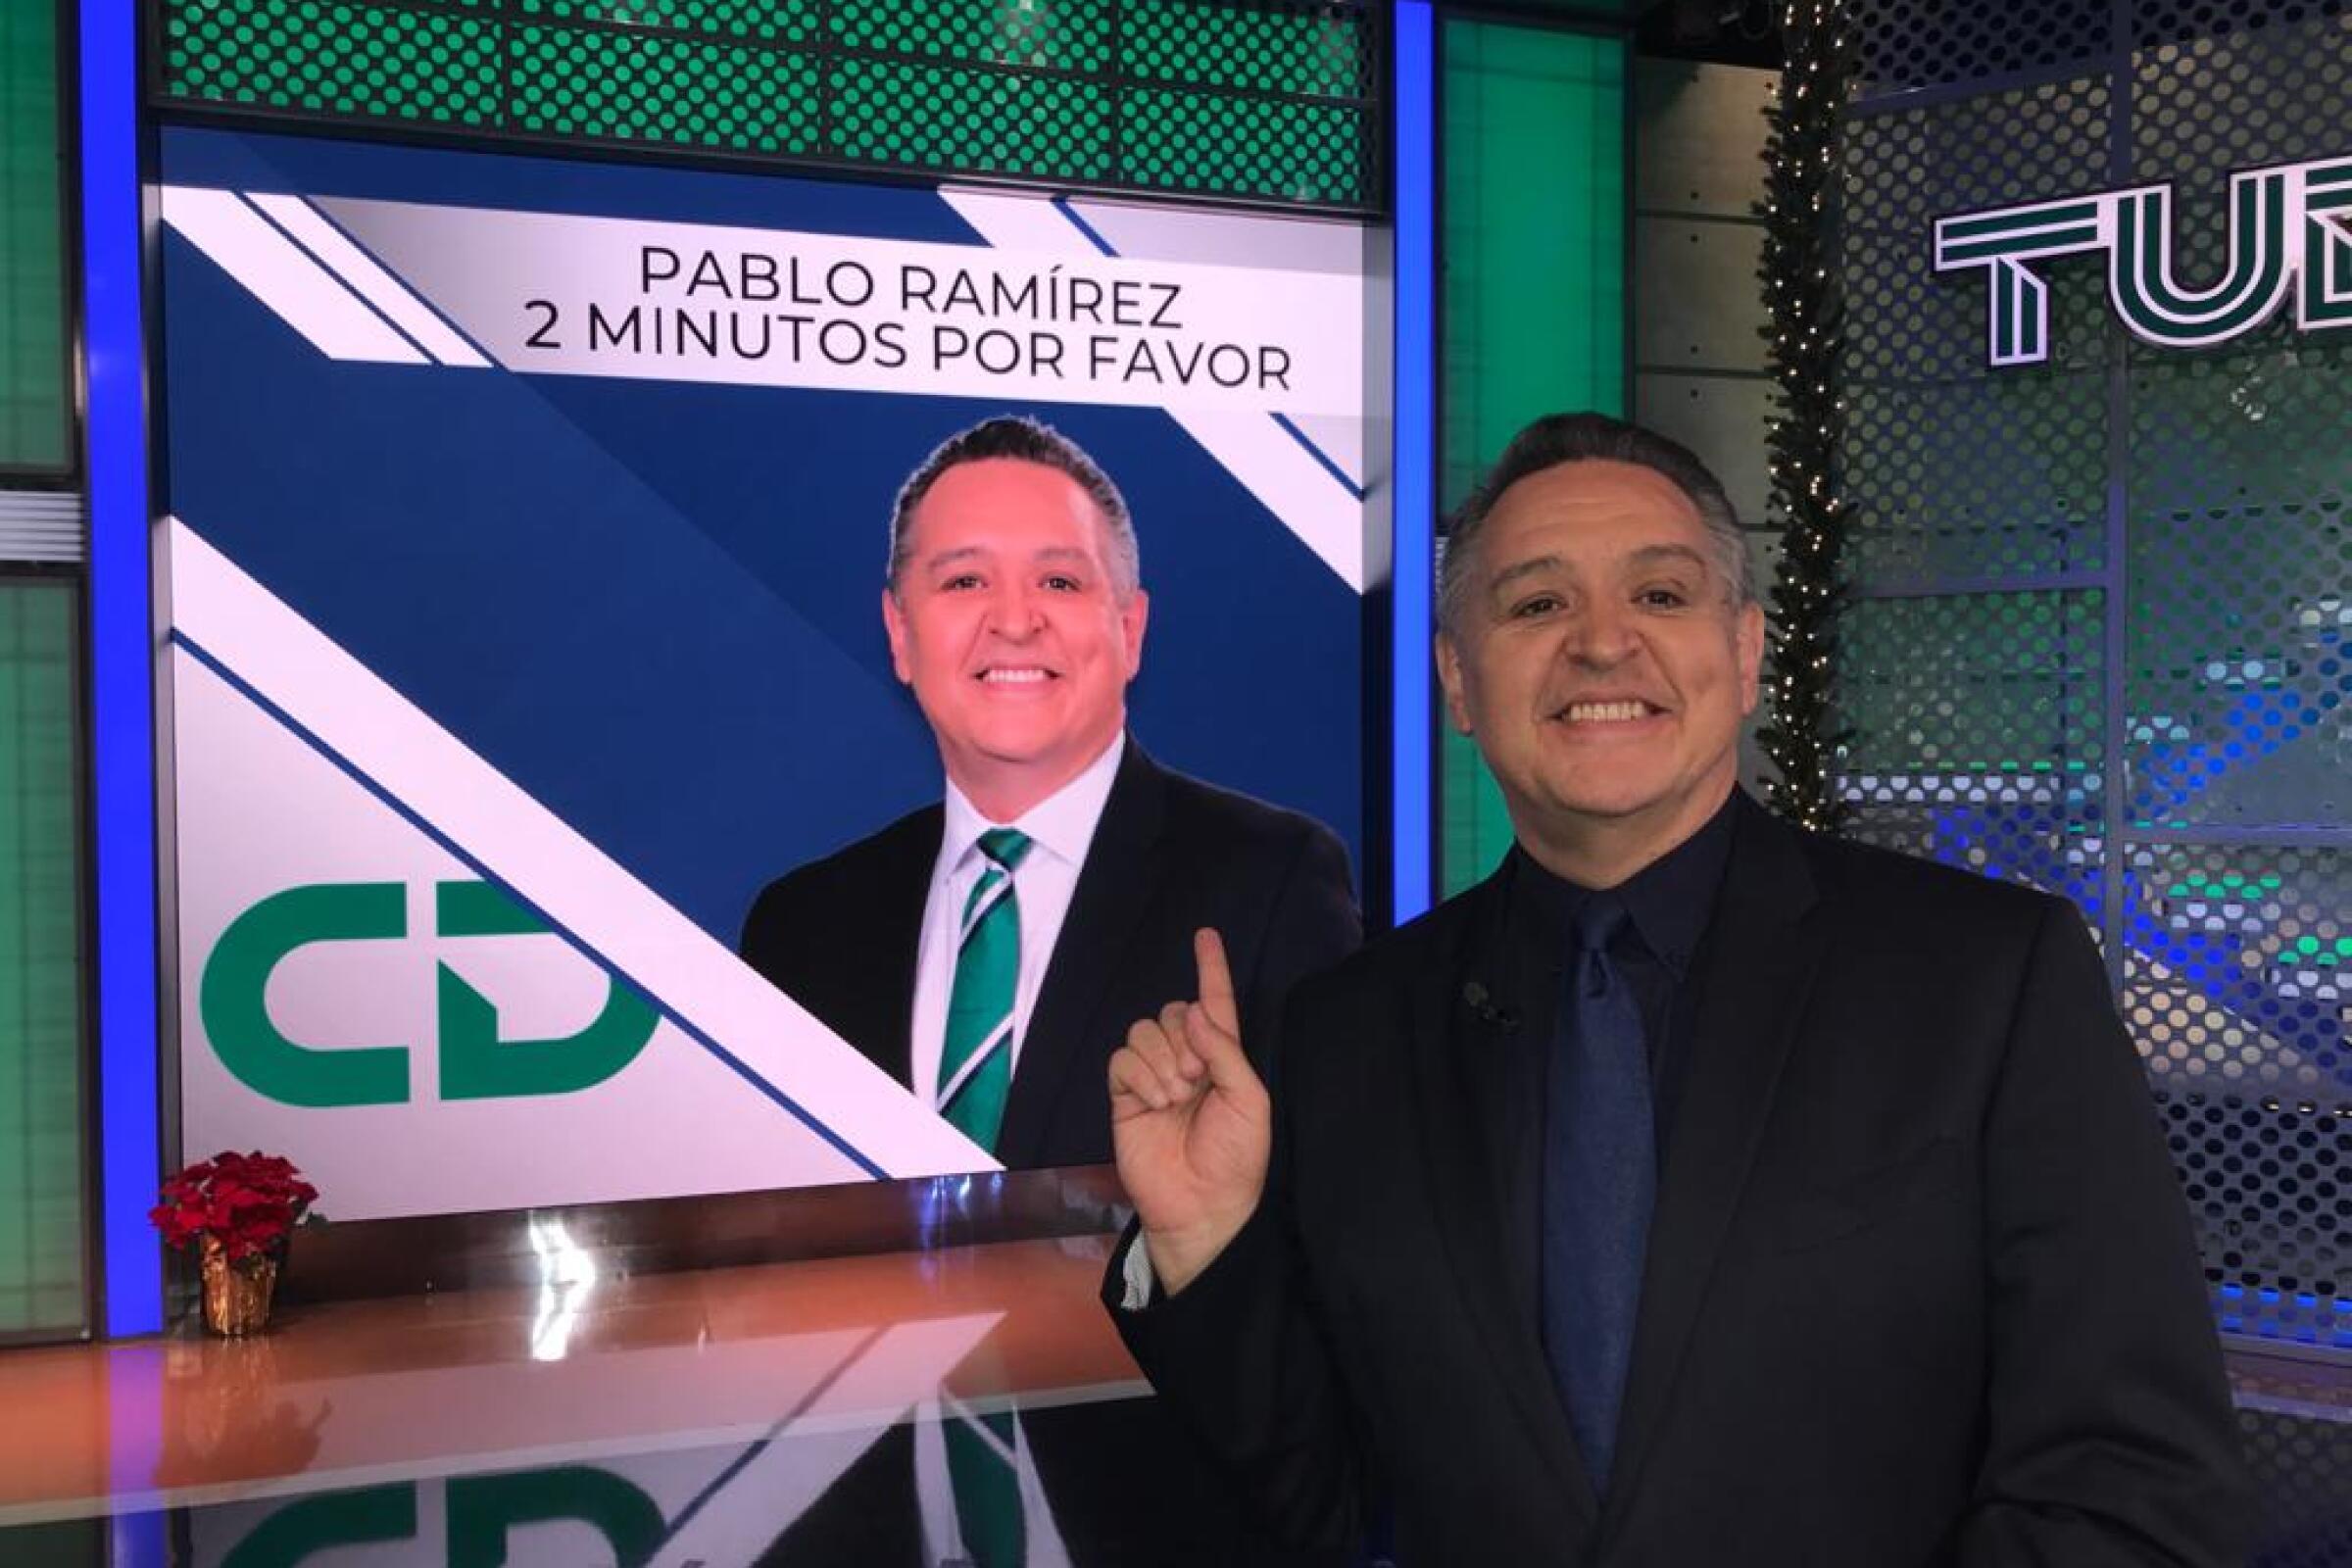 Pablo Ramírez.